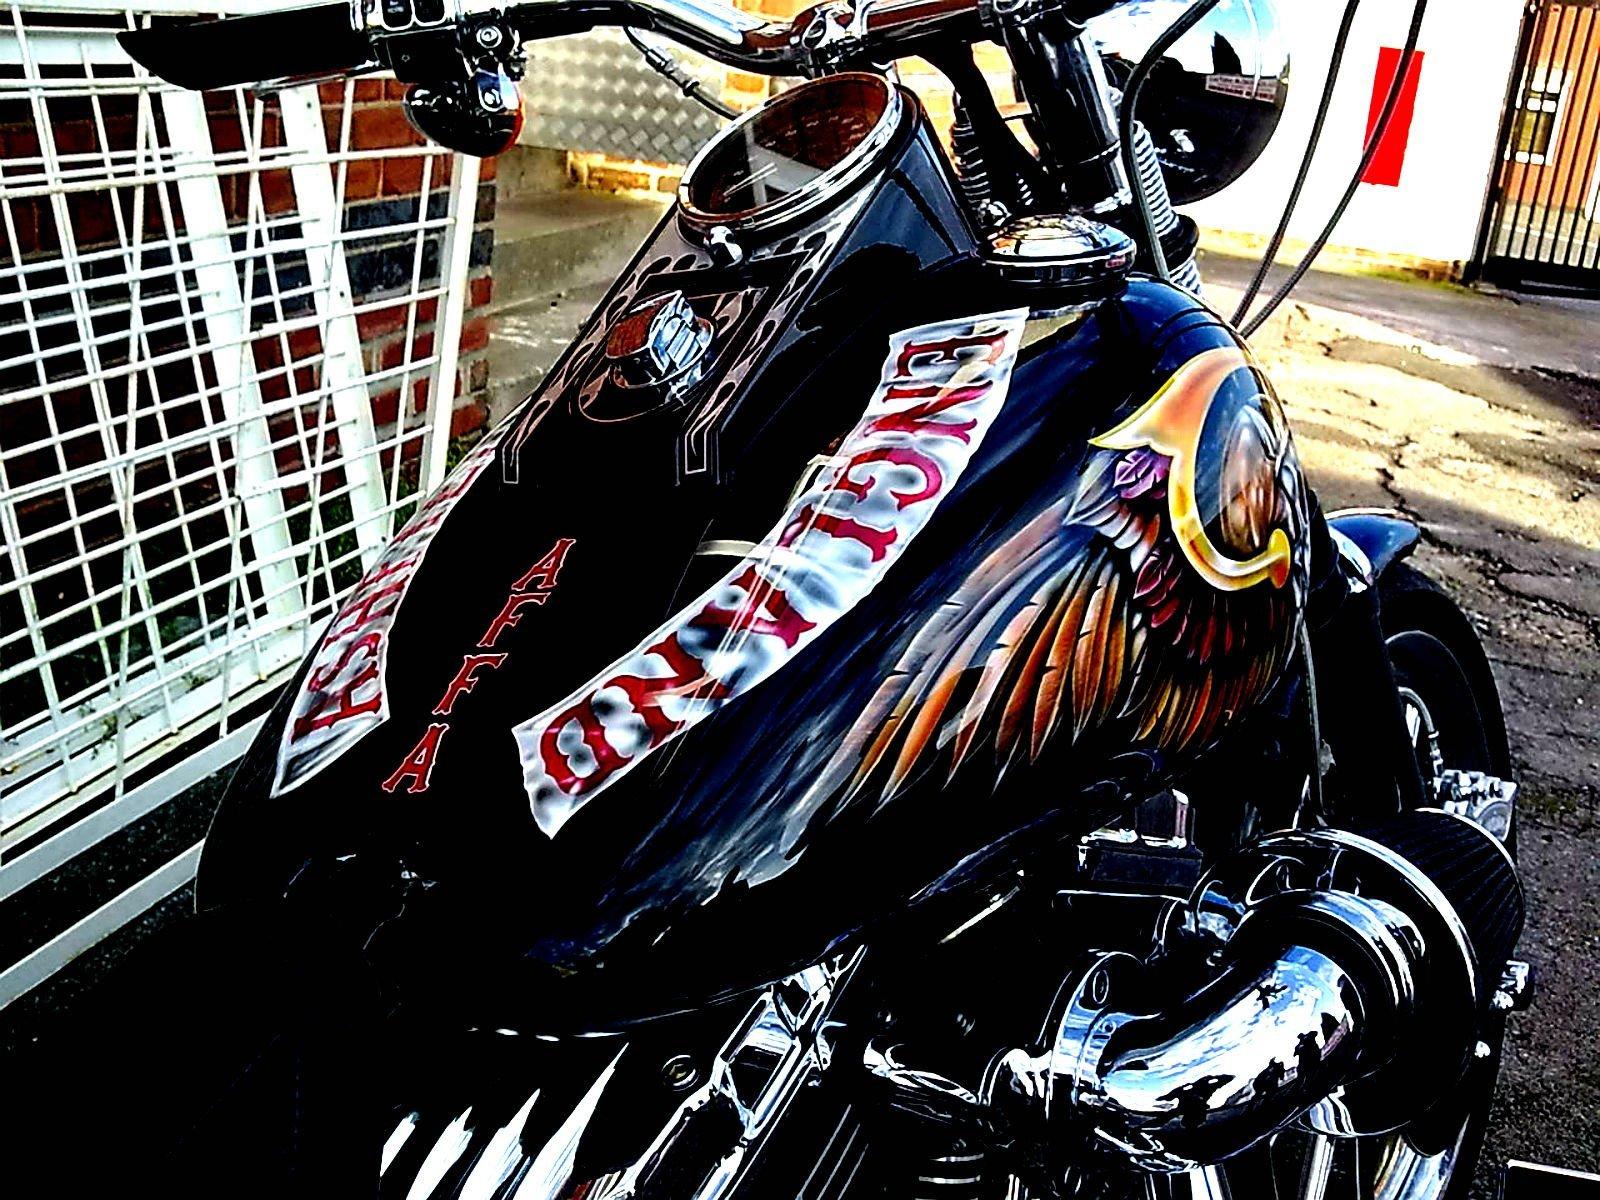 biker wallpaper - photo #27